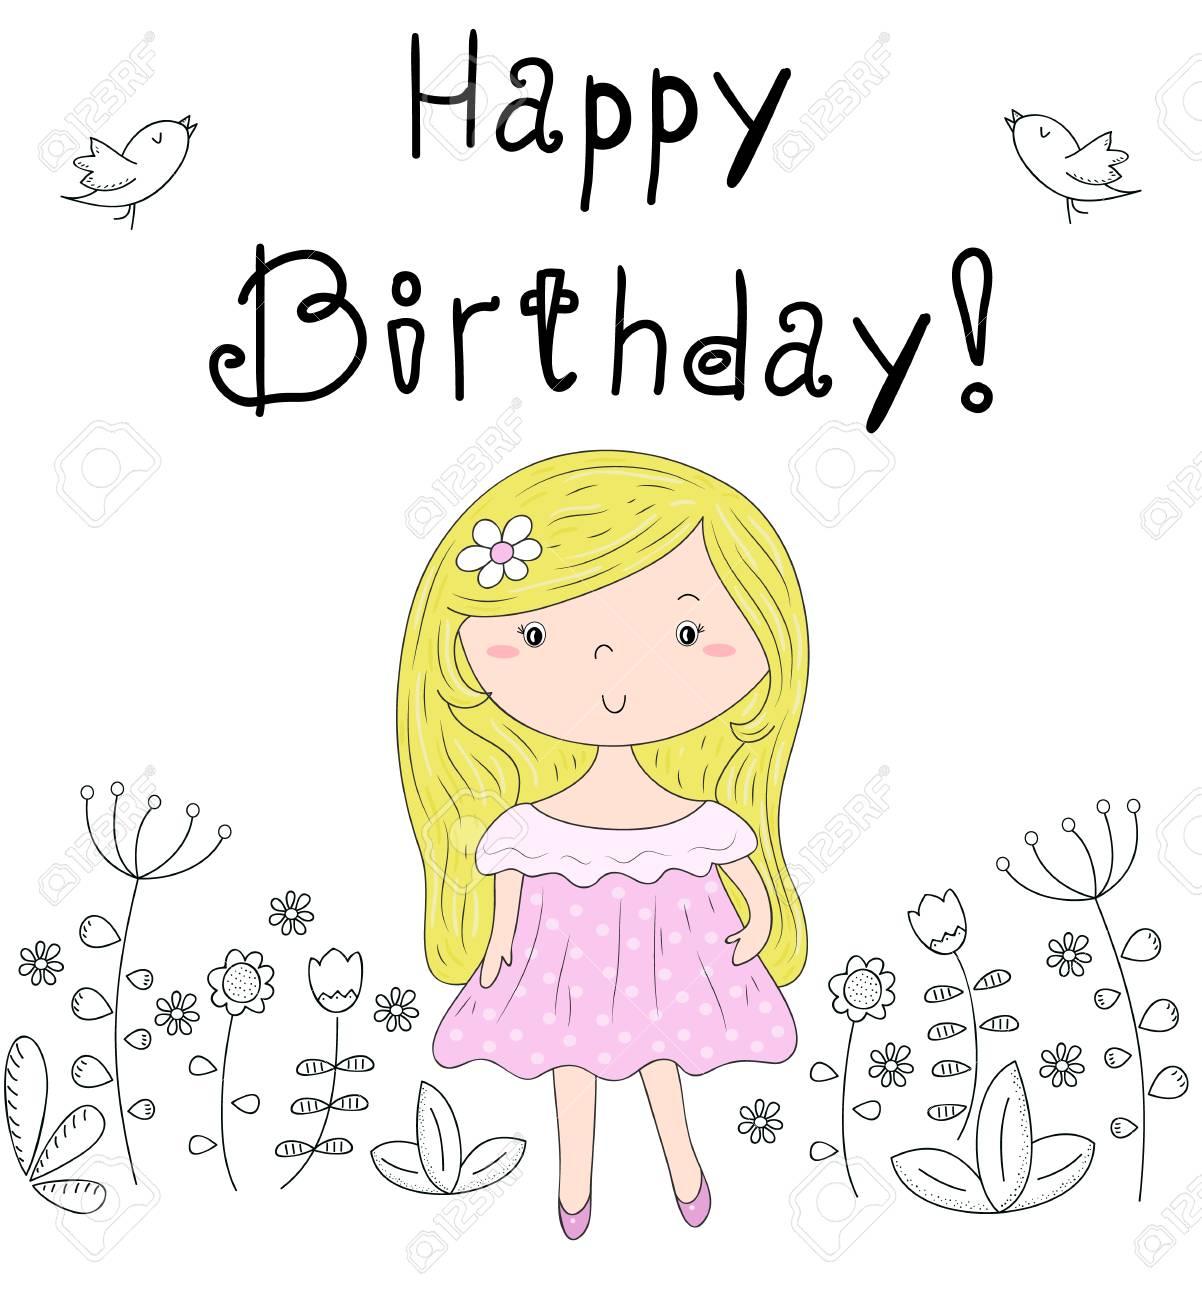 Happy Birthday Card Pretty Little Girl Vector Illustration Royalty